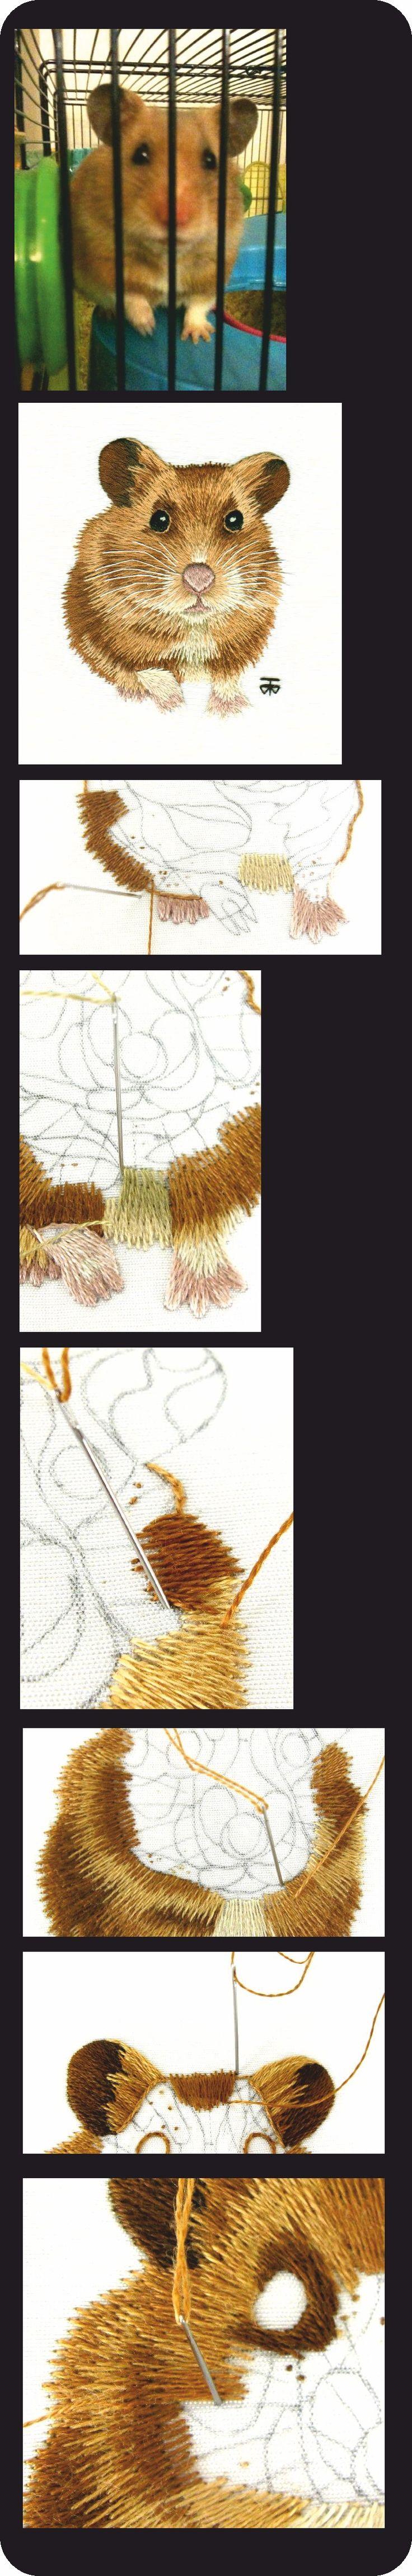 Hamster, peinture à l'aiguille http://www.berlinembroidery.com/hamsterworkinprogress.htm